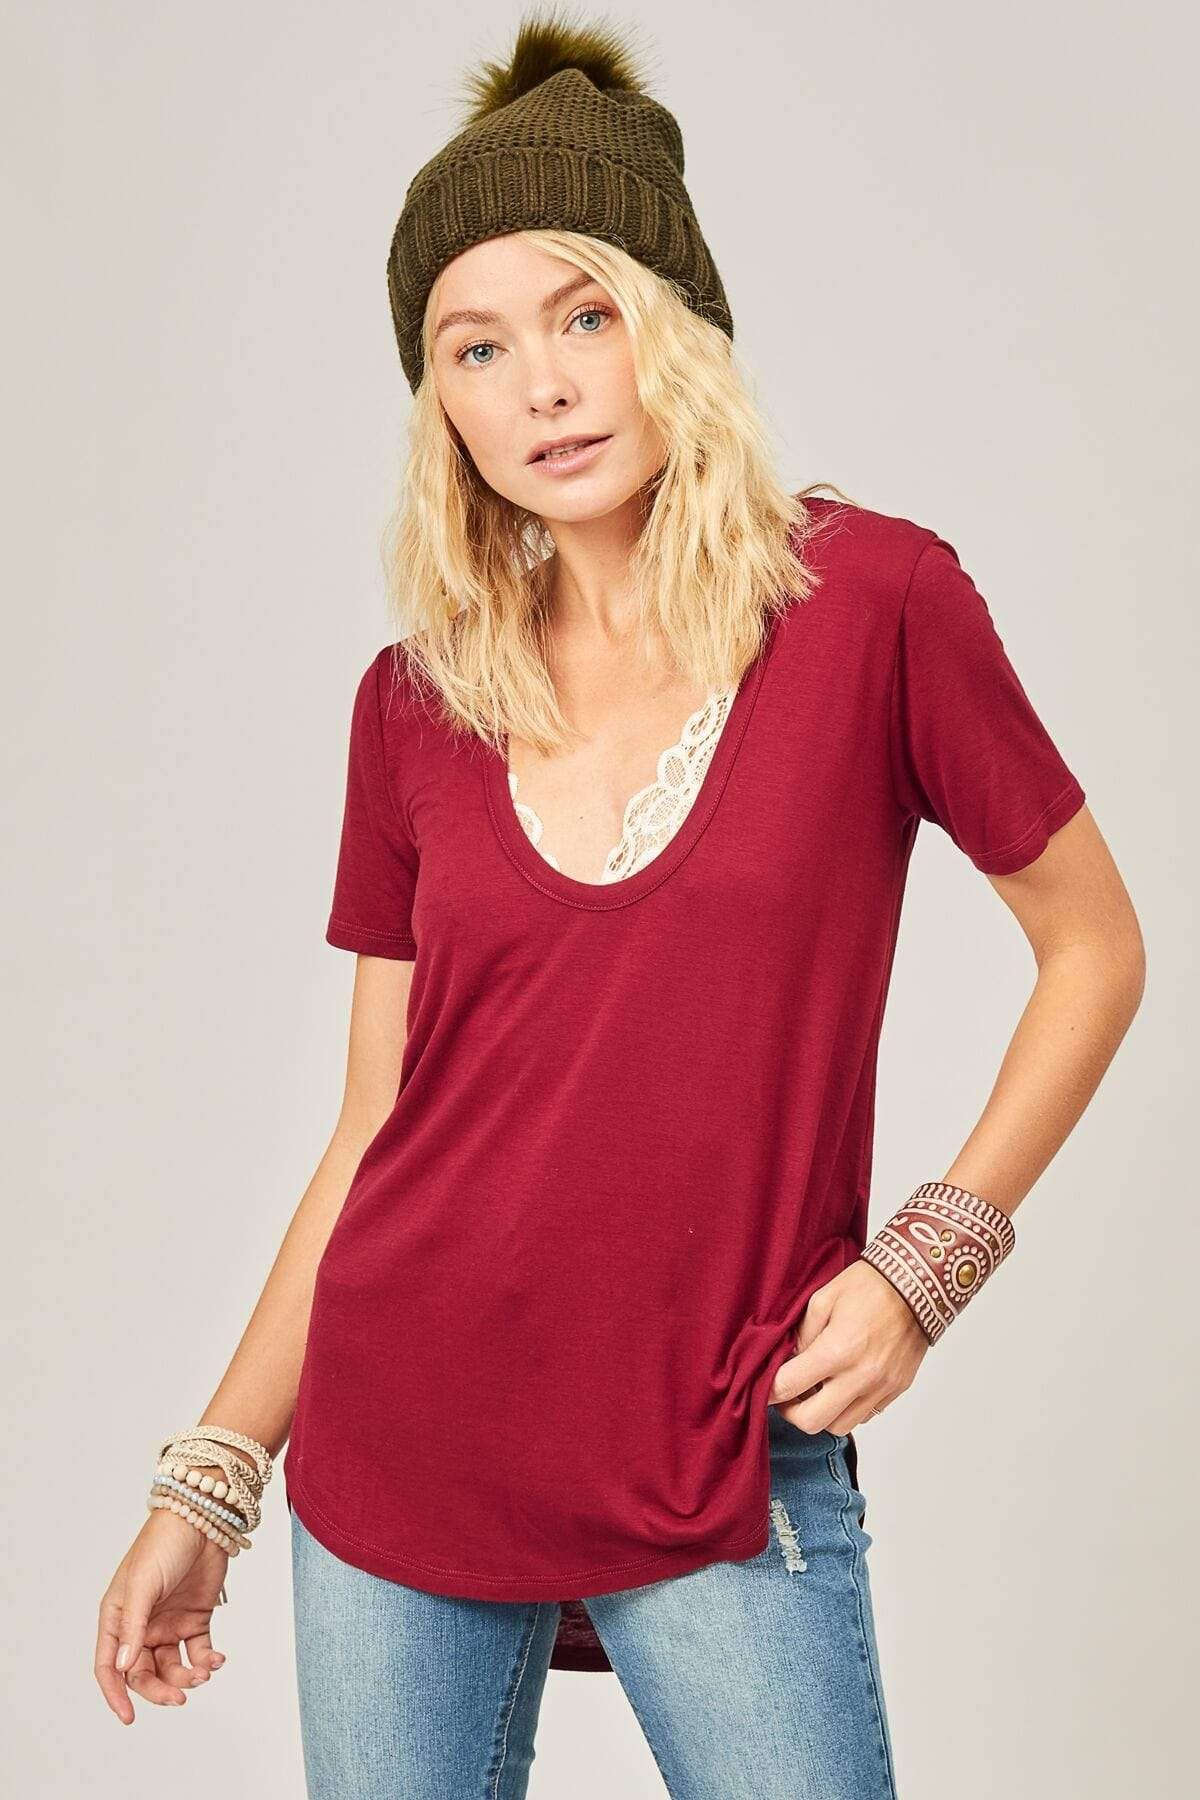 Kristi Long Sleeve Lace Top